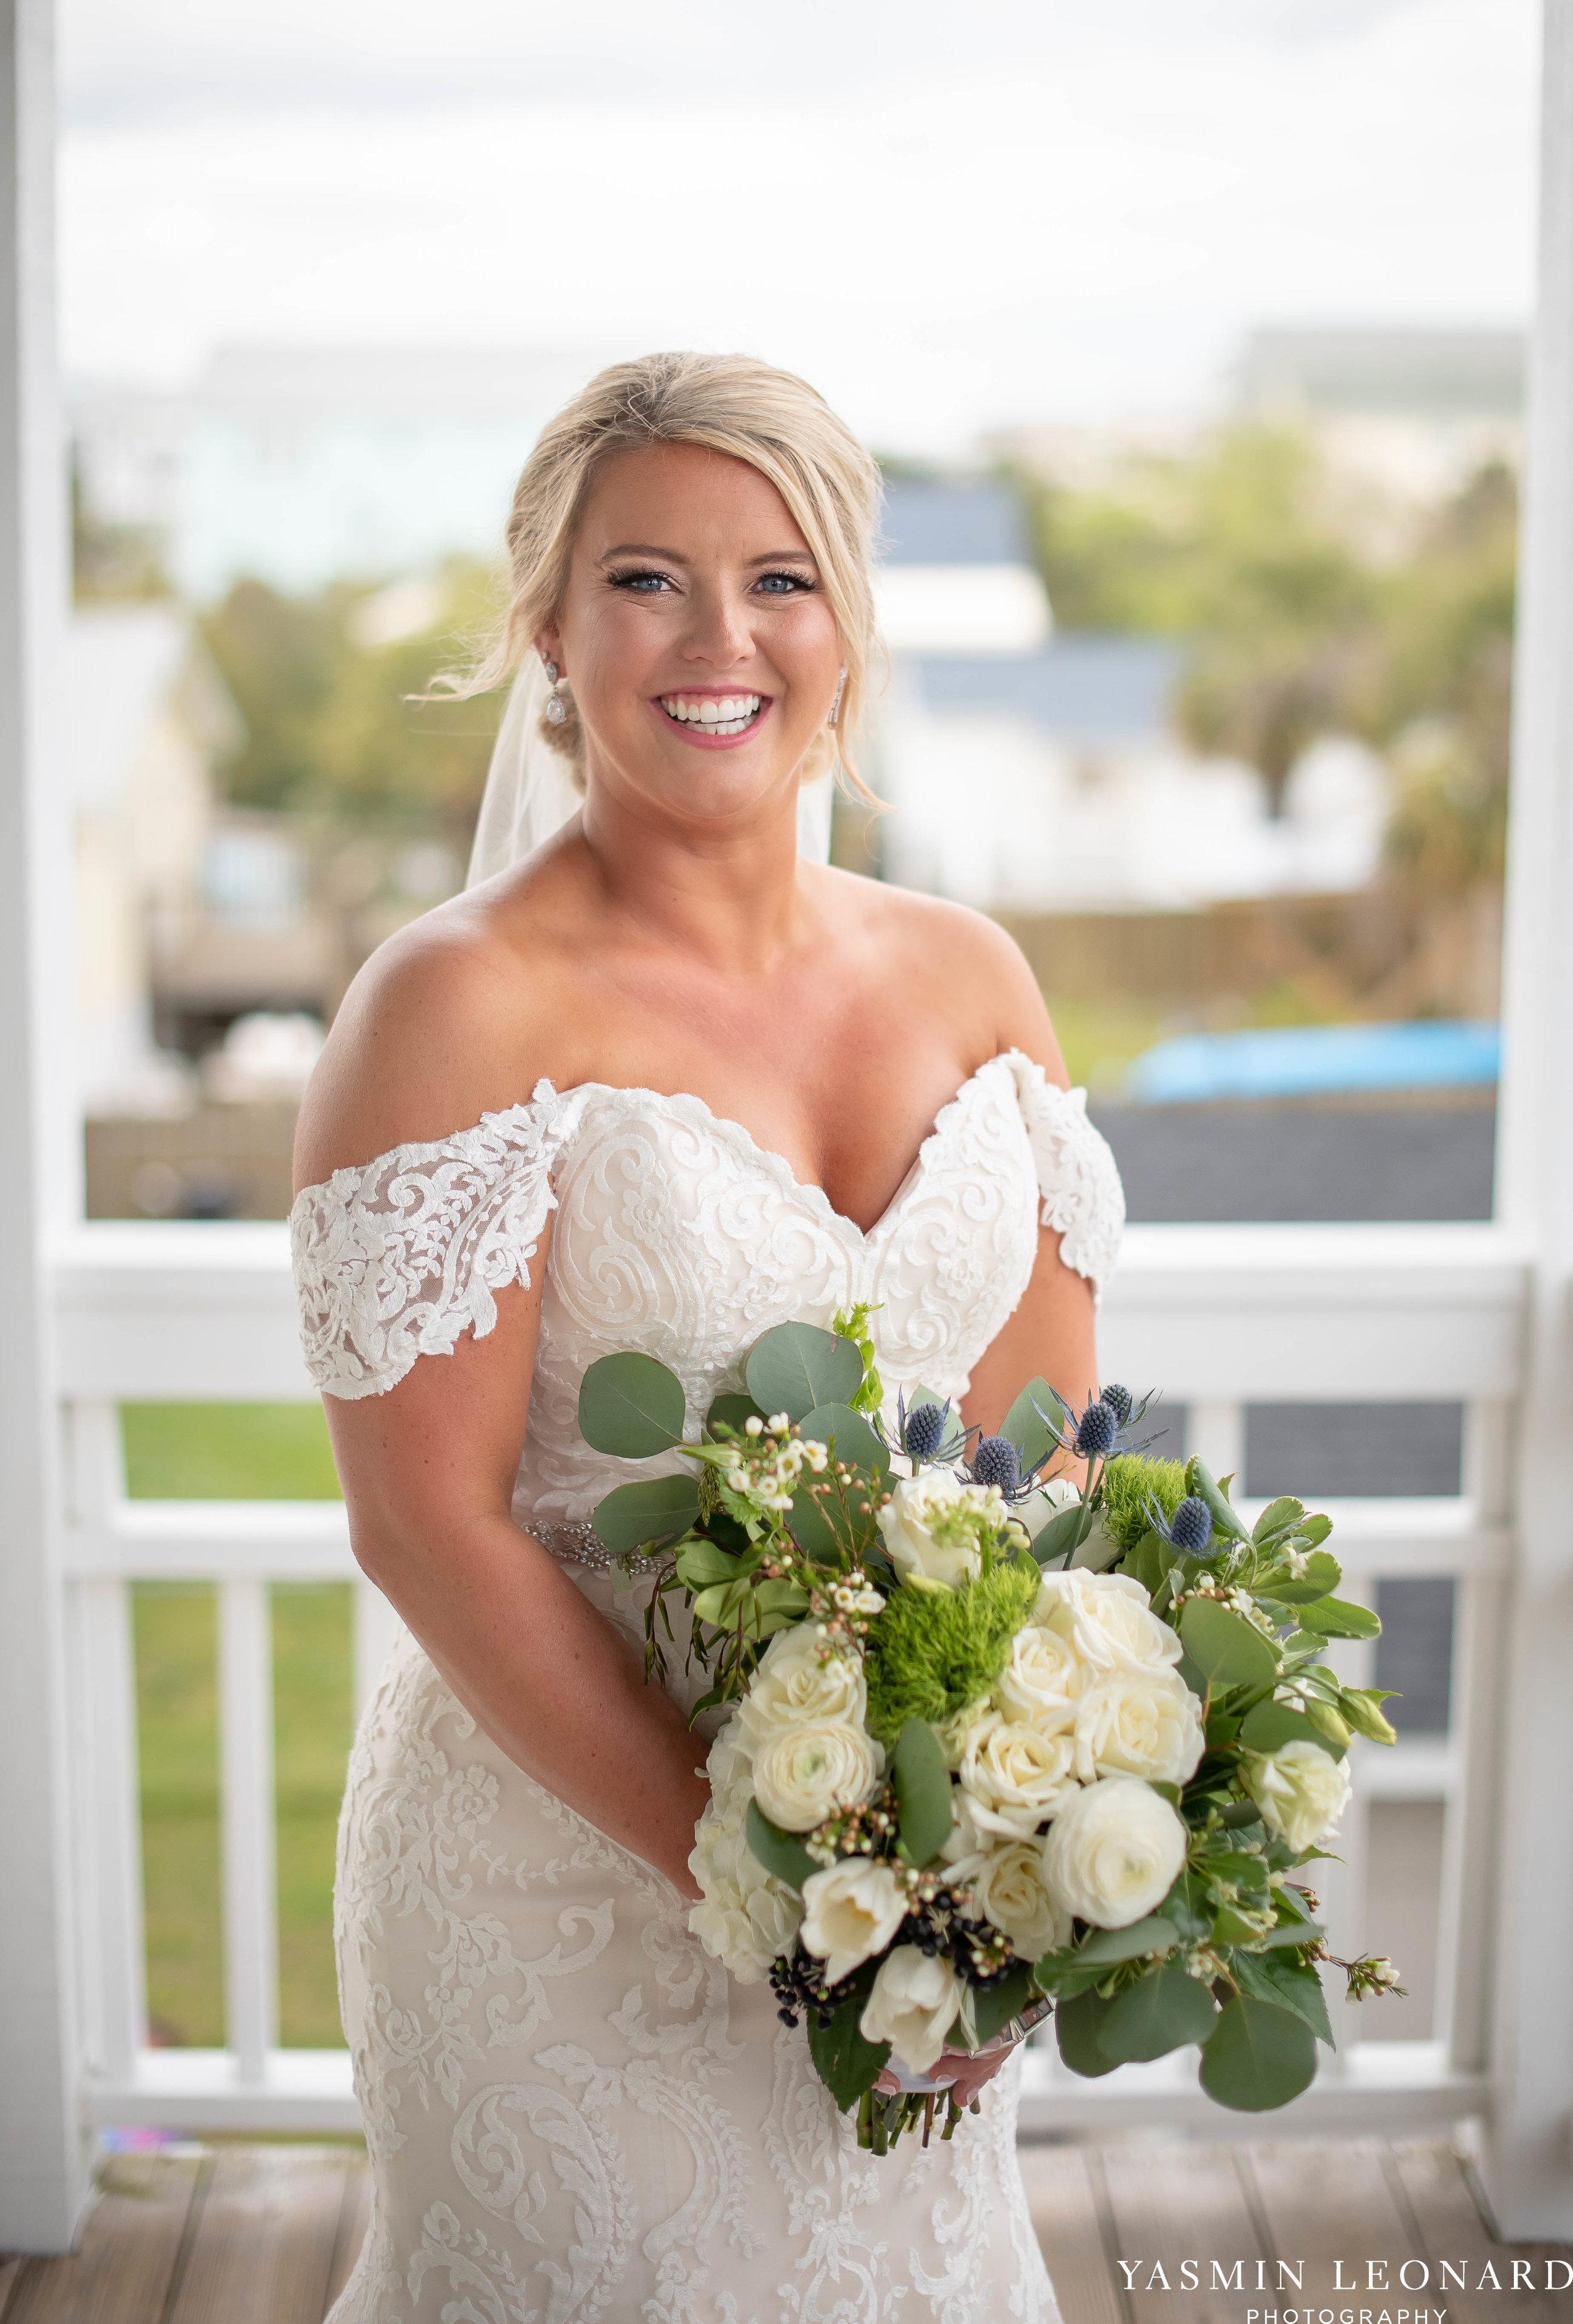 Carolina Beach Wedding - Fort Fisher Wedding - NC Acquarium - Beach Wedding - NC Wedding - Beach Wedding Inspiration - Beach Bride-7.jpg